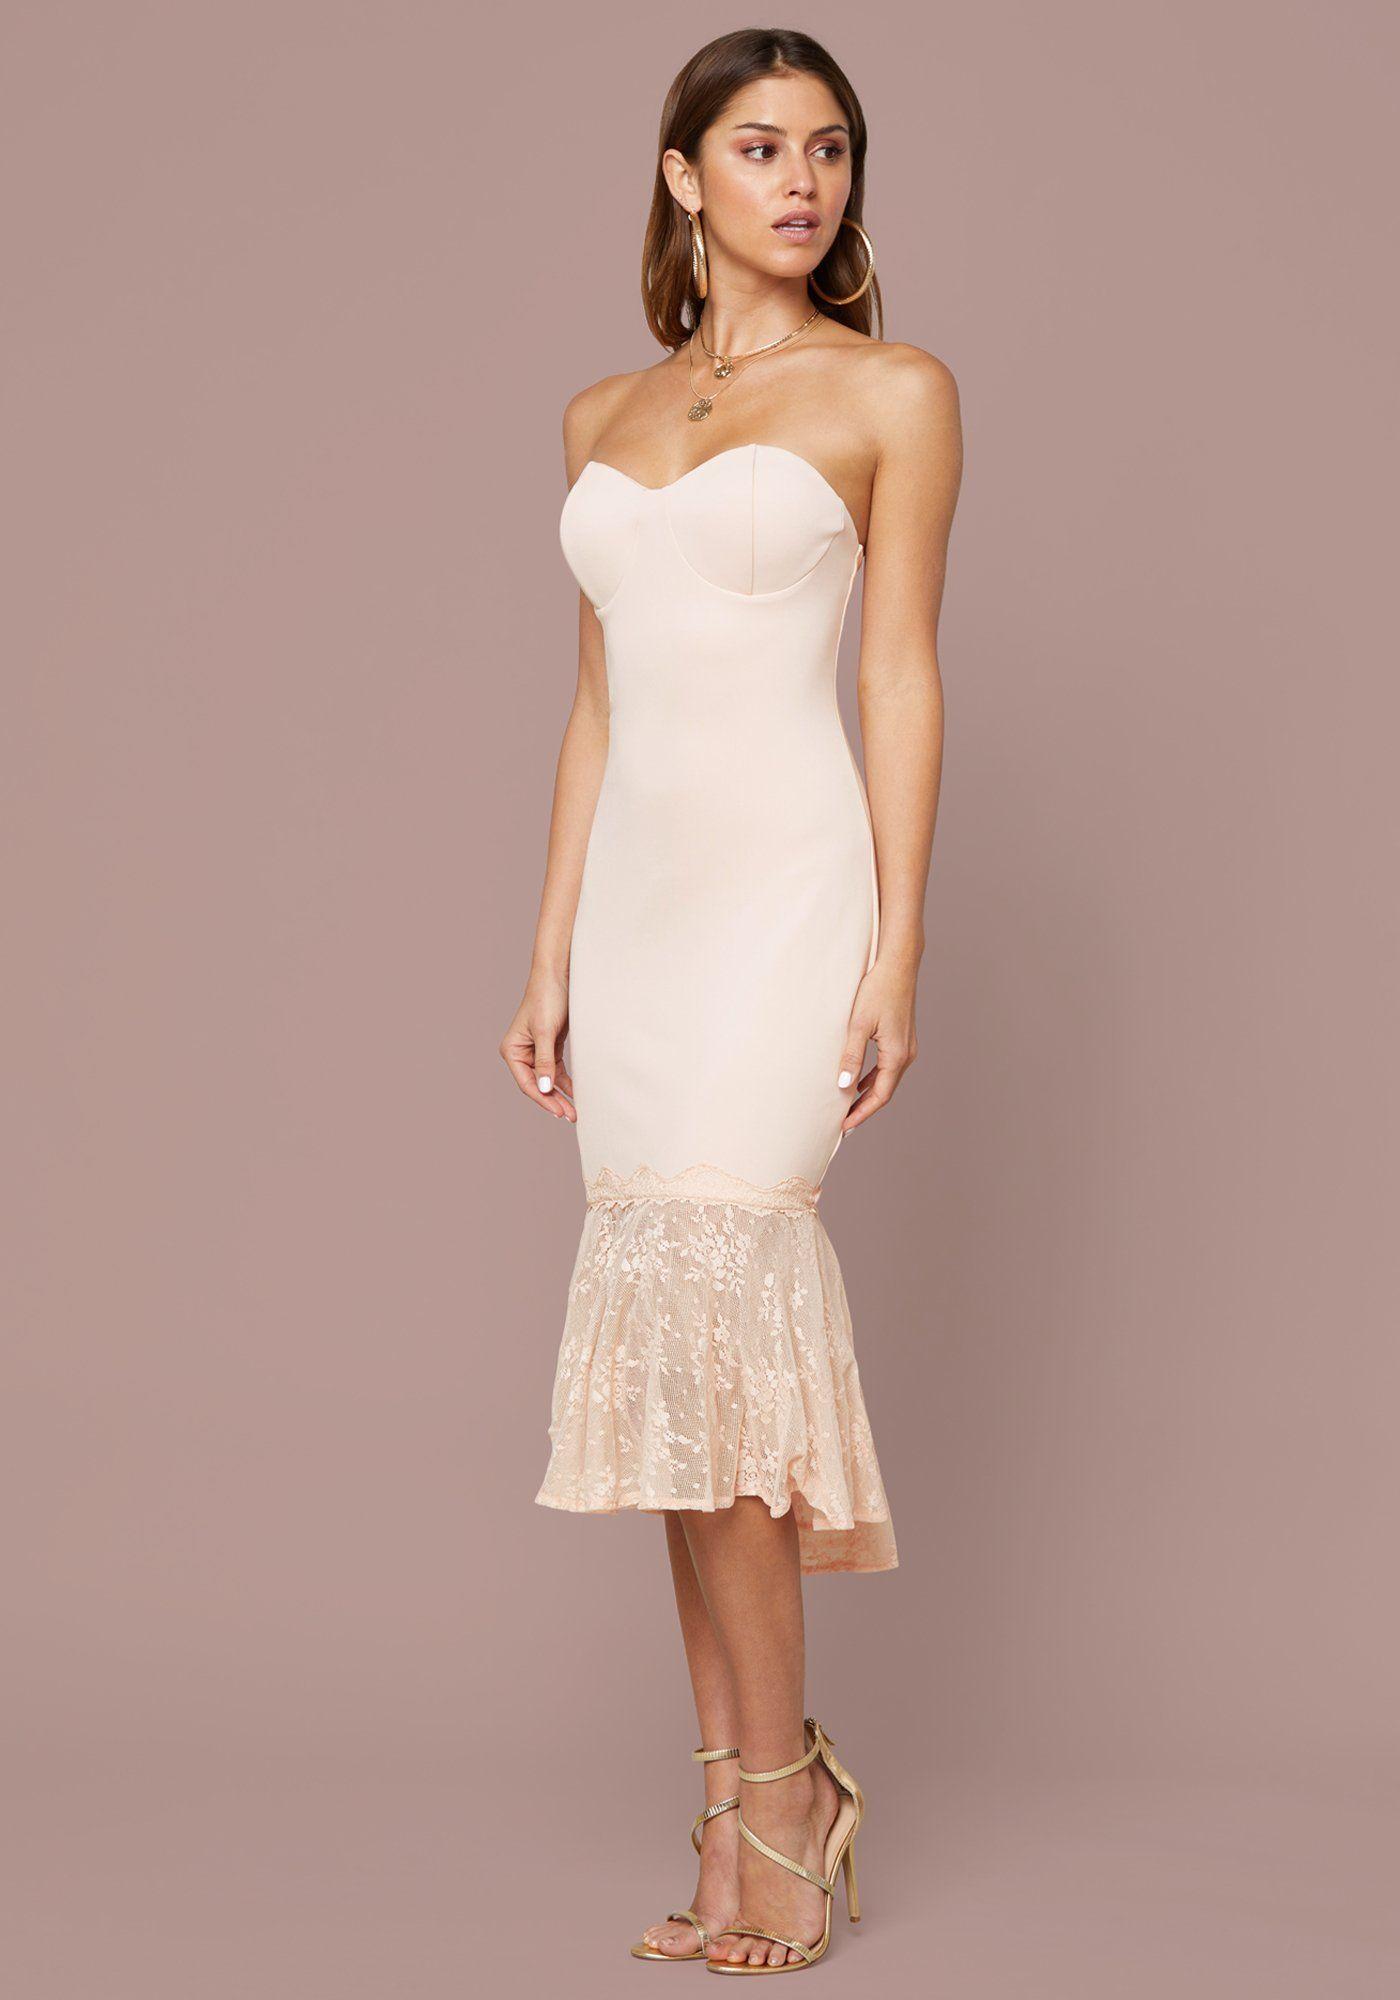 Scuba Strapless Midi Dress Bebe Dresses Sweetheart Strapless Dress Strapless Midi Dress [ 2000 x 1400 Pixel ]